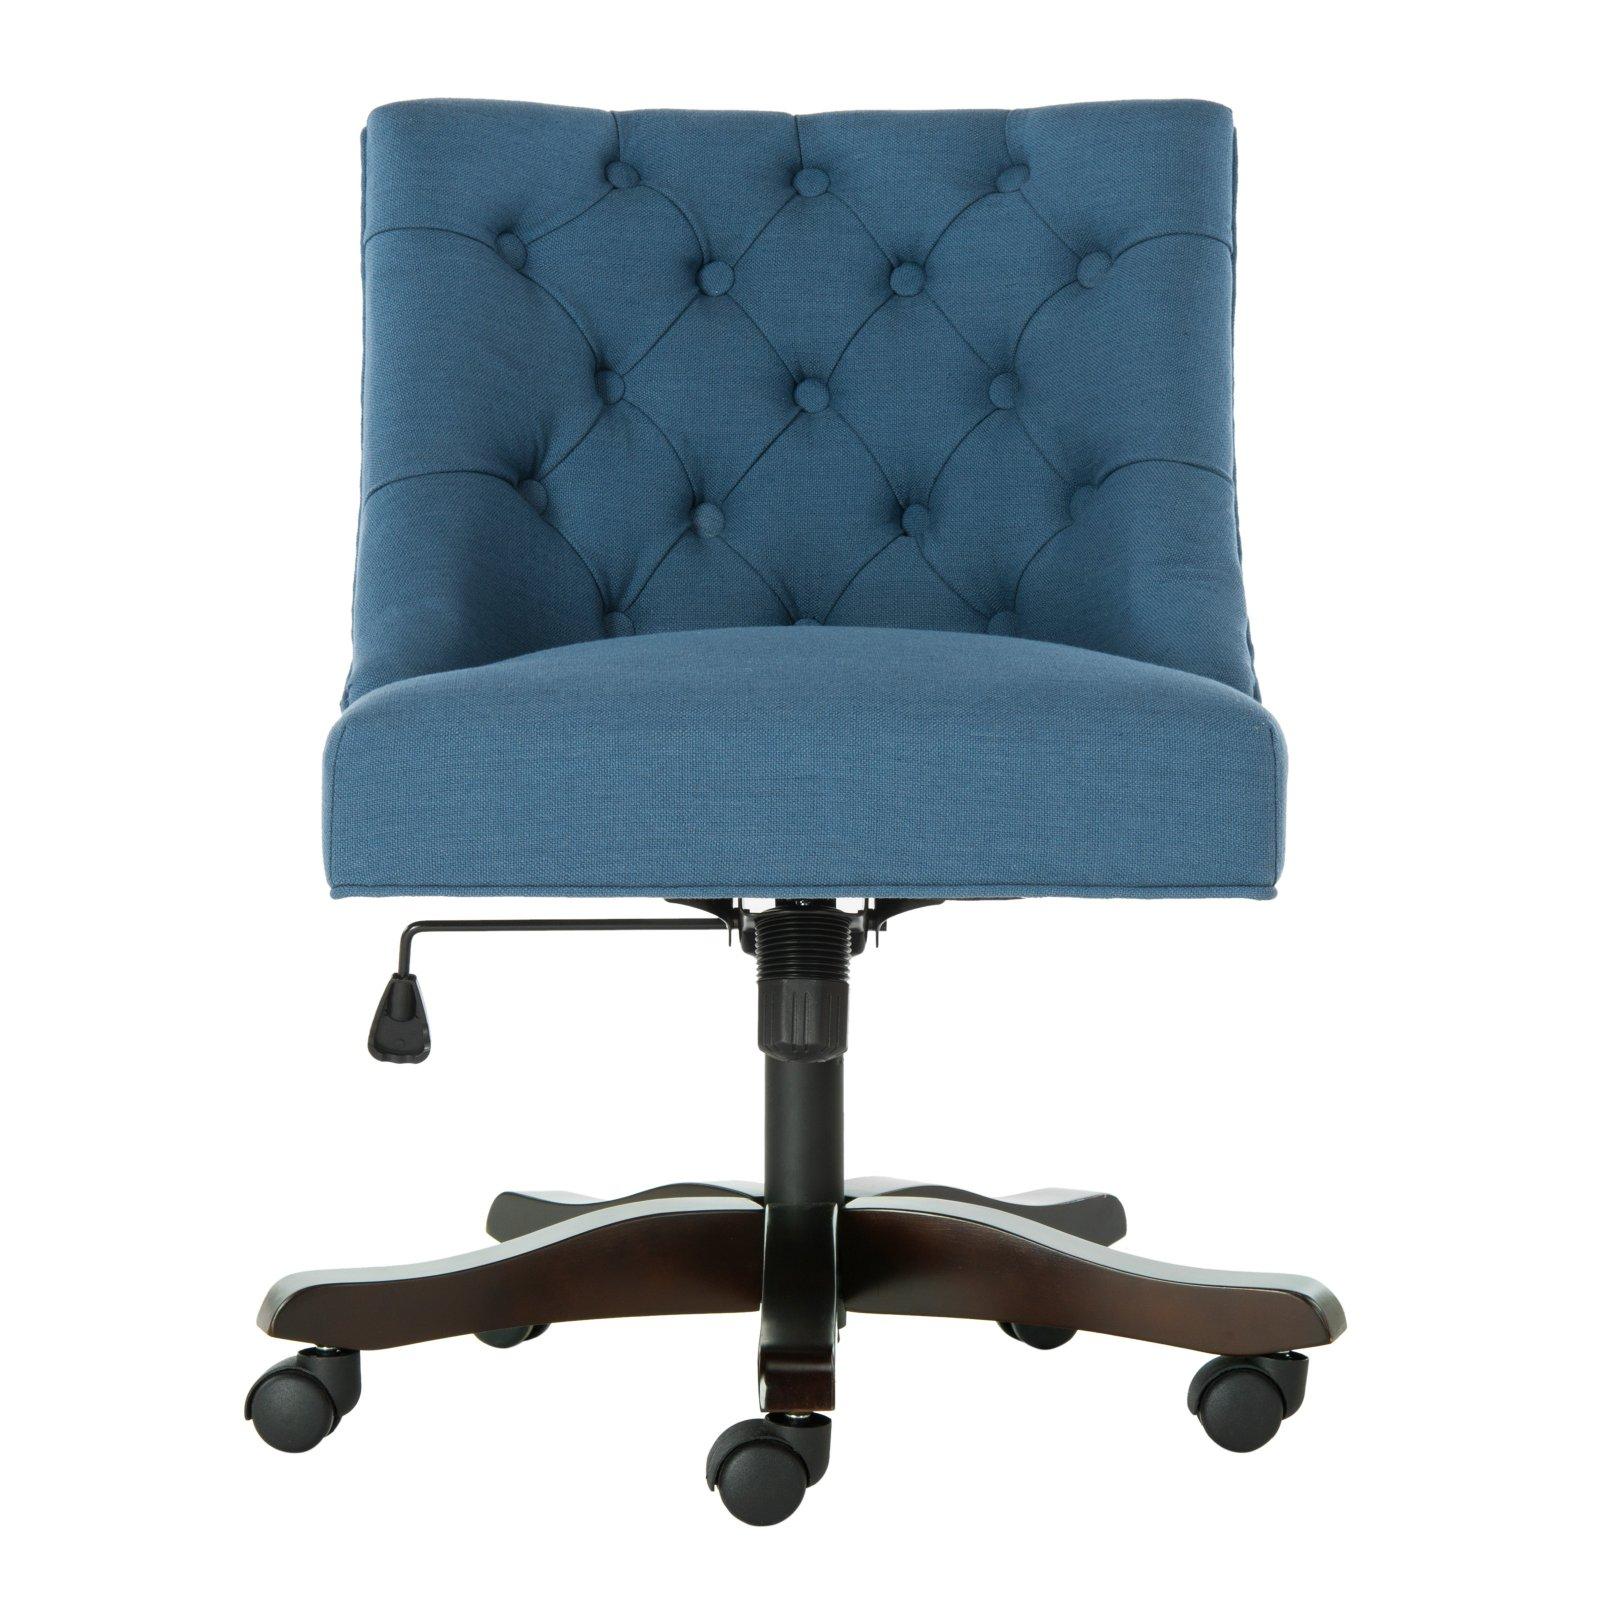 Swivel Office Chair, Chair